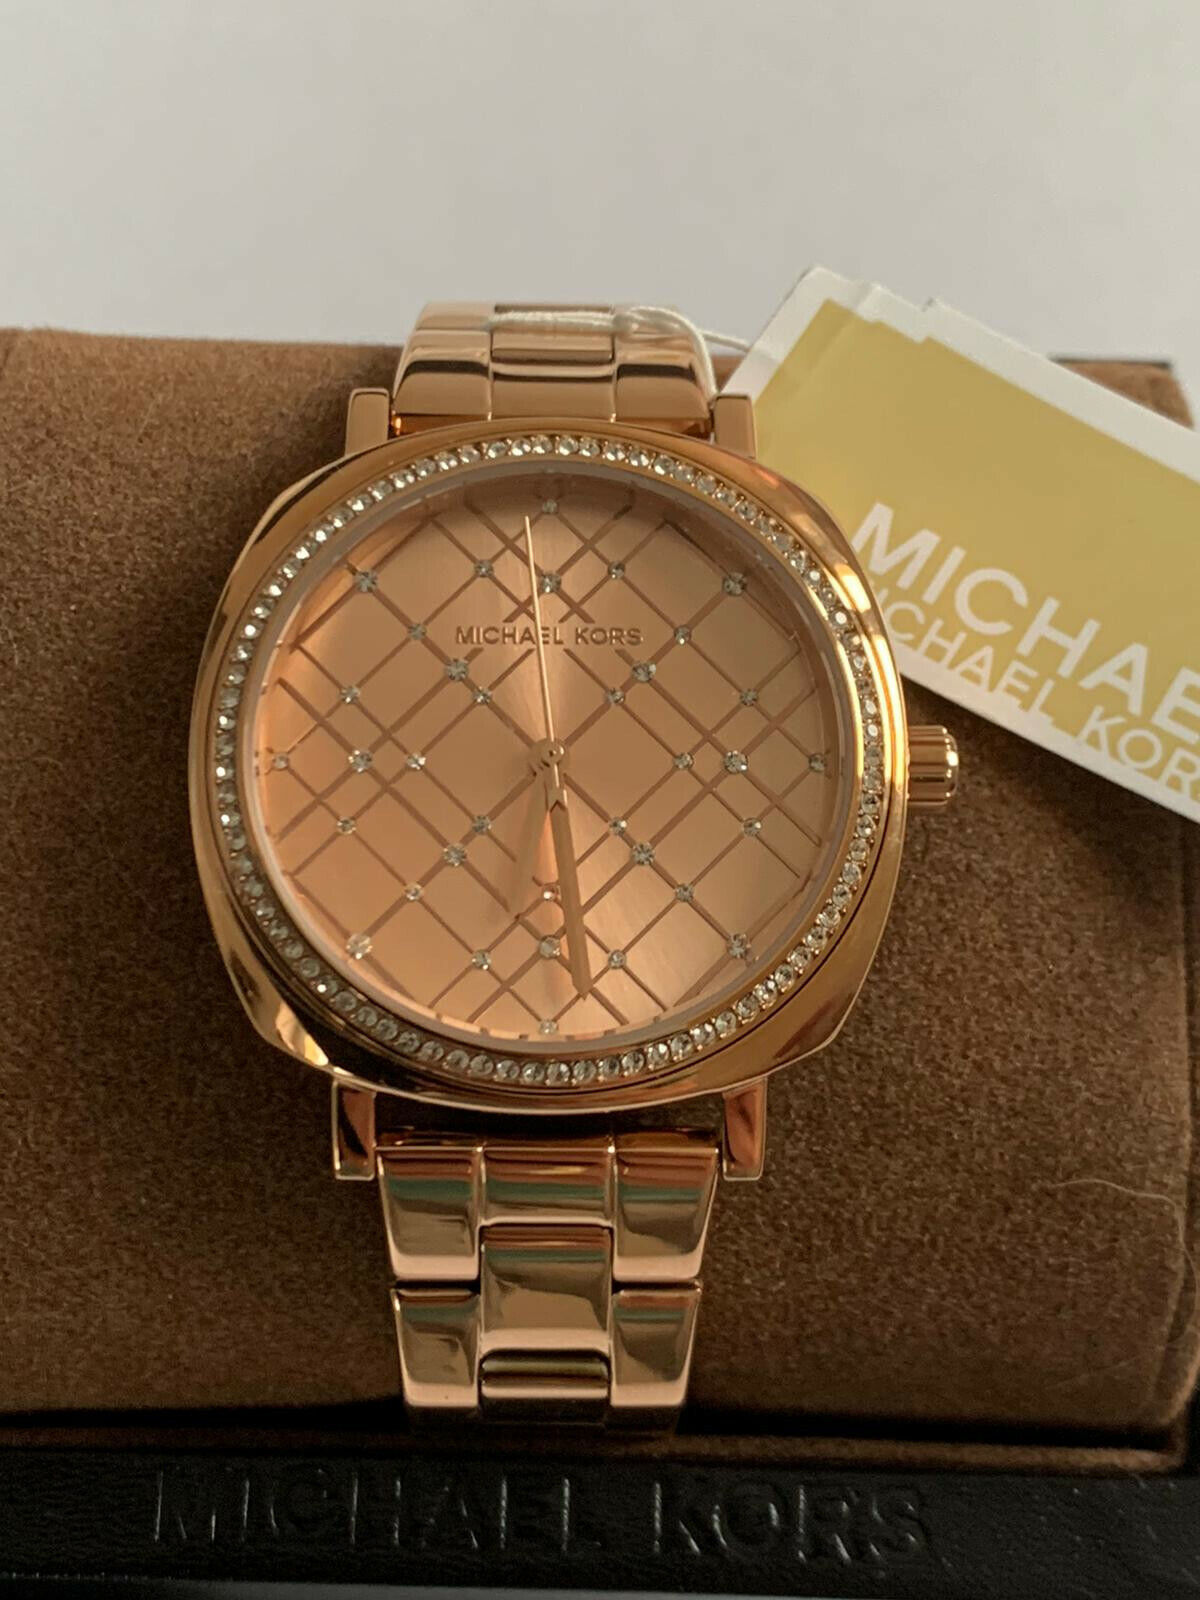 MICHAEL KORS Damen Armbanduhr Uhr Watch Rosè - Gold NEU und OVP Original - Box